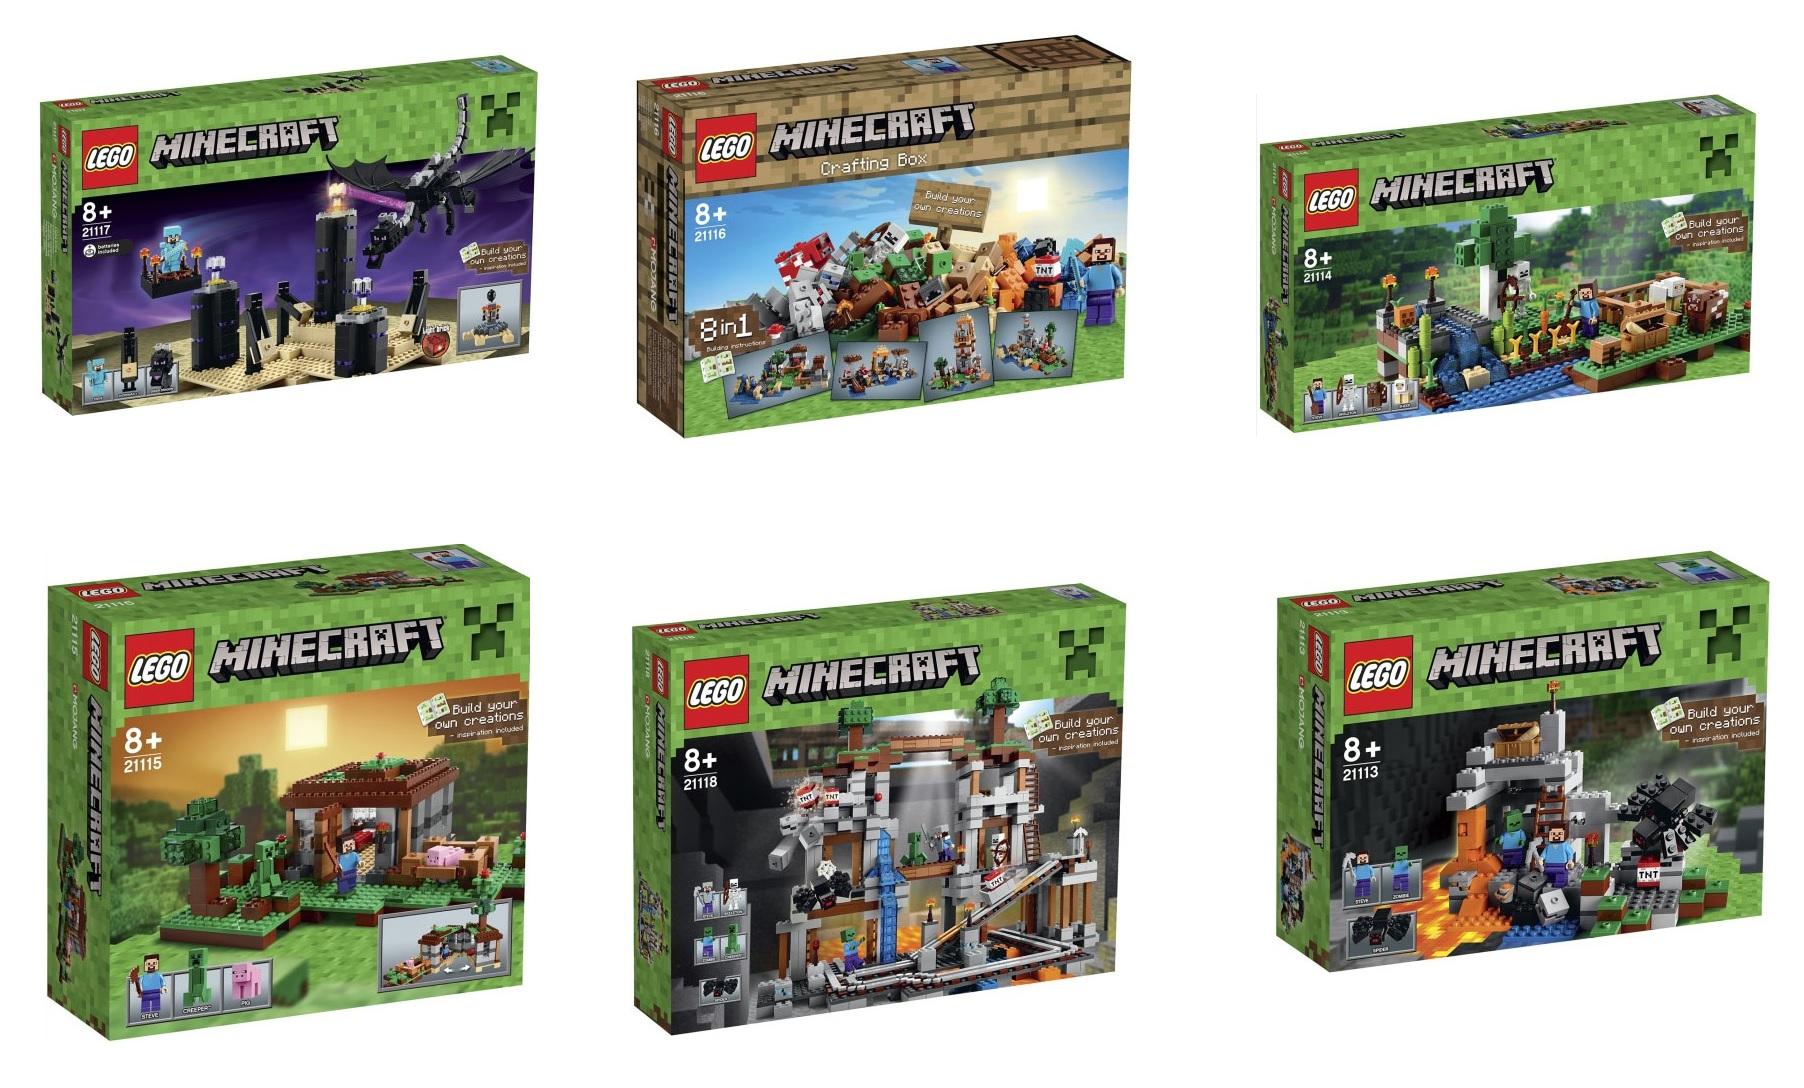 LEGO Minecraft Microworld 2015 Sets 21117 The Ender Dragon, 21116